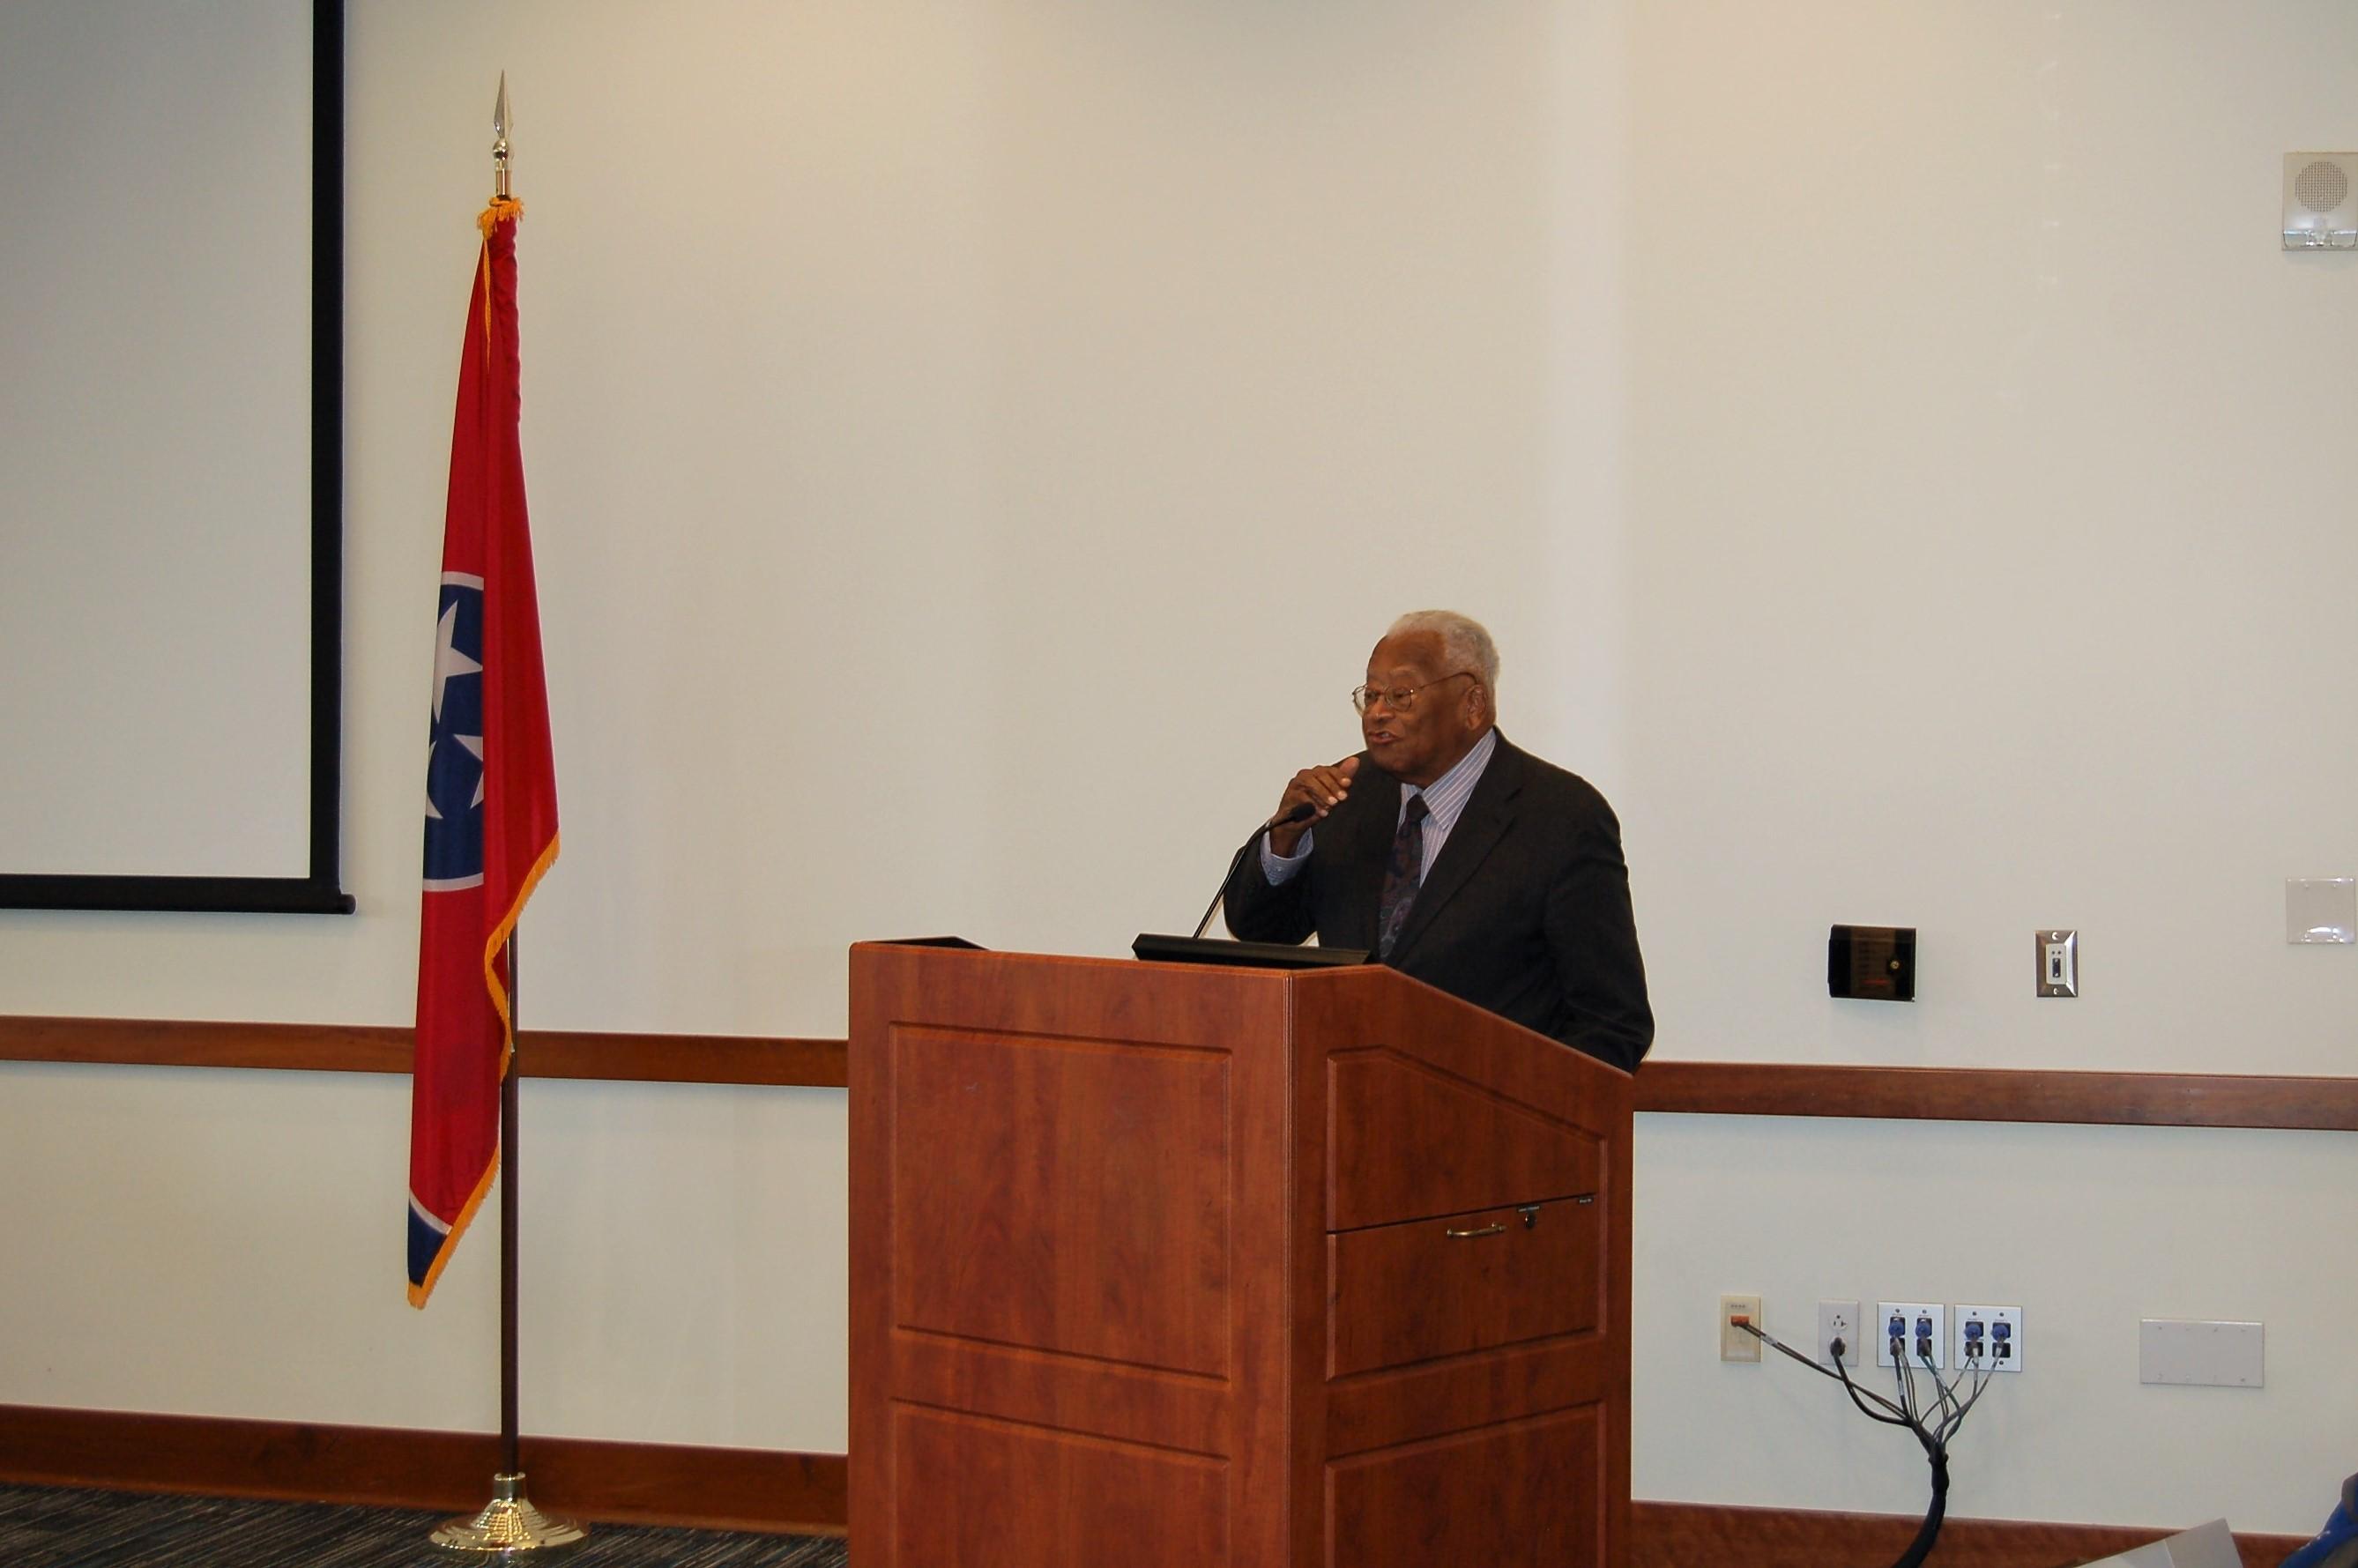 Dr. Lawson gives keynote speech